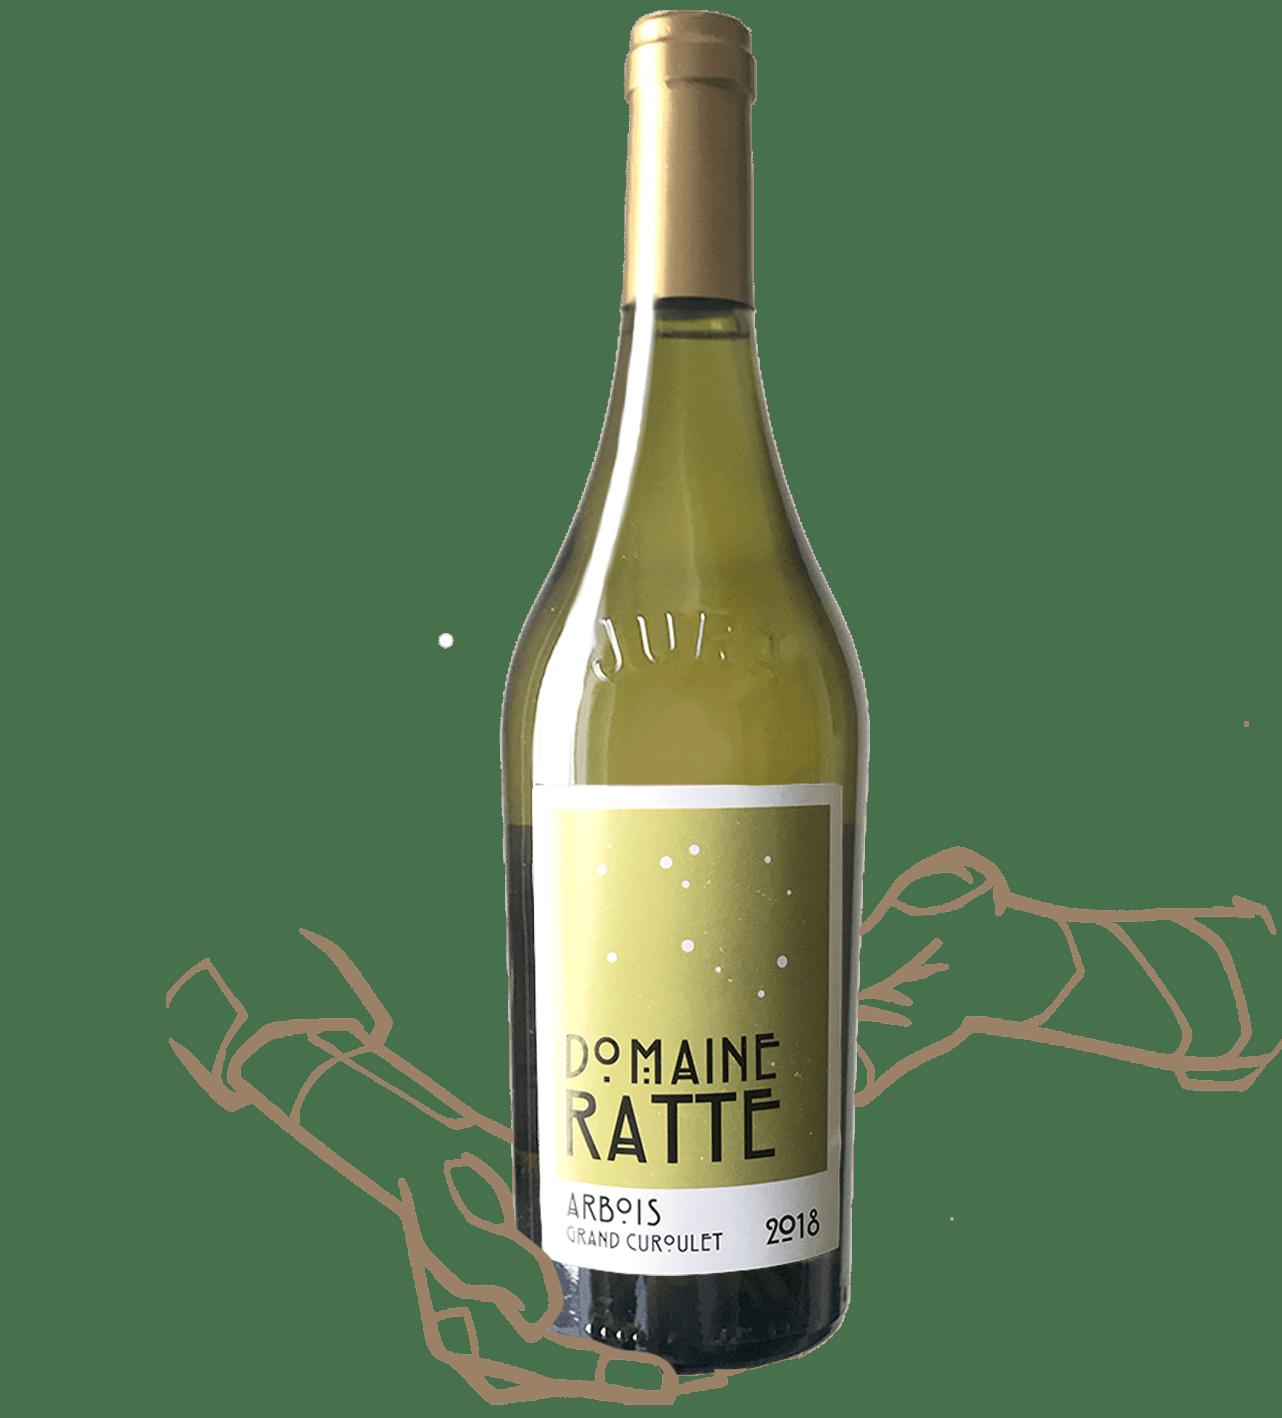 Domaine Ratte - Grand Curoulet, vin naturel du Jura